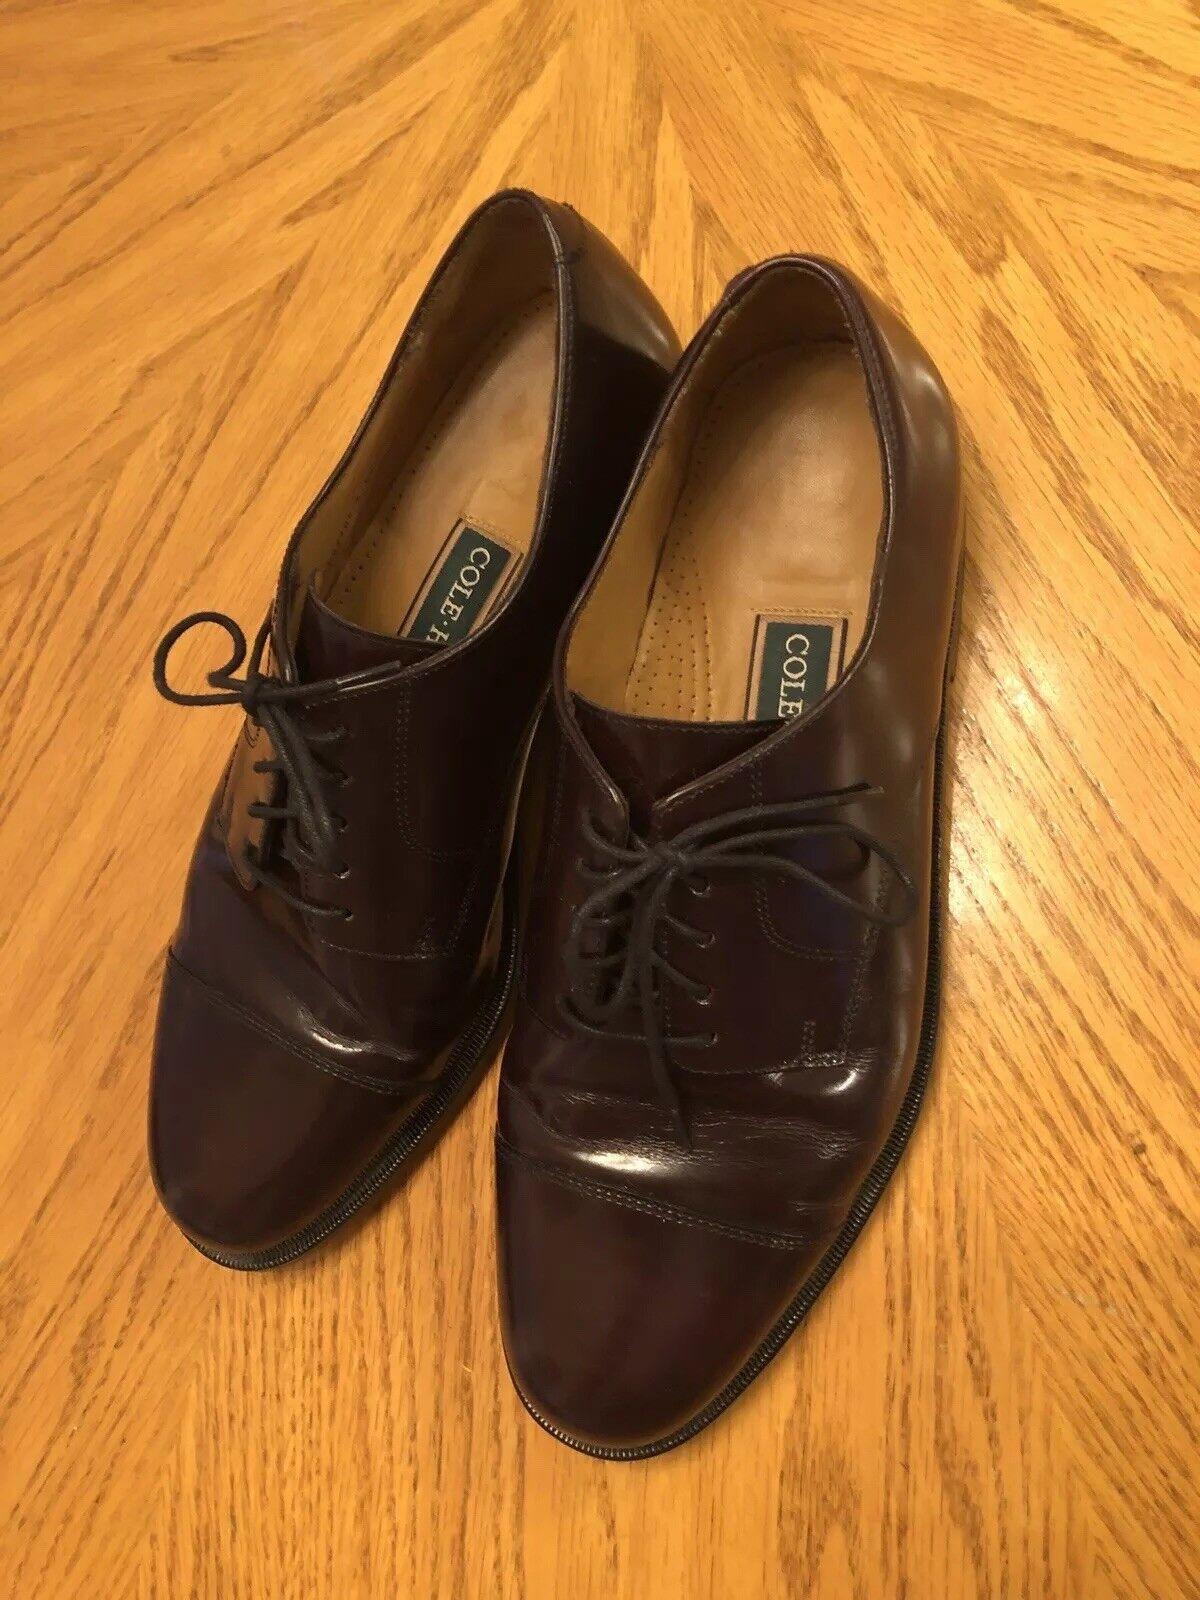 Cole Haan Men's Oxfords Oxfords Oxfords Leather Burgundy Captoe Größe 10D fdb7f1